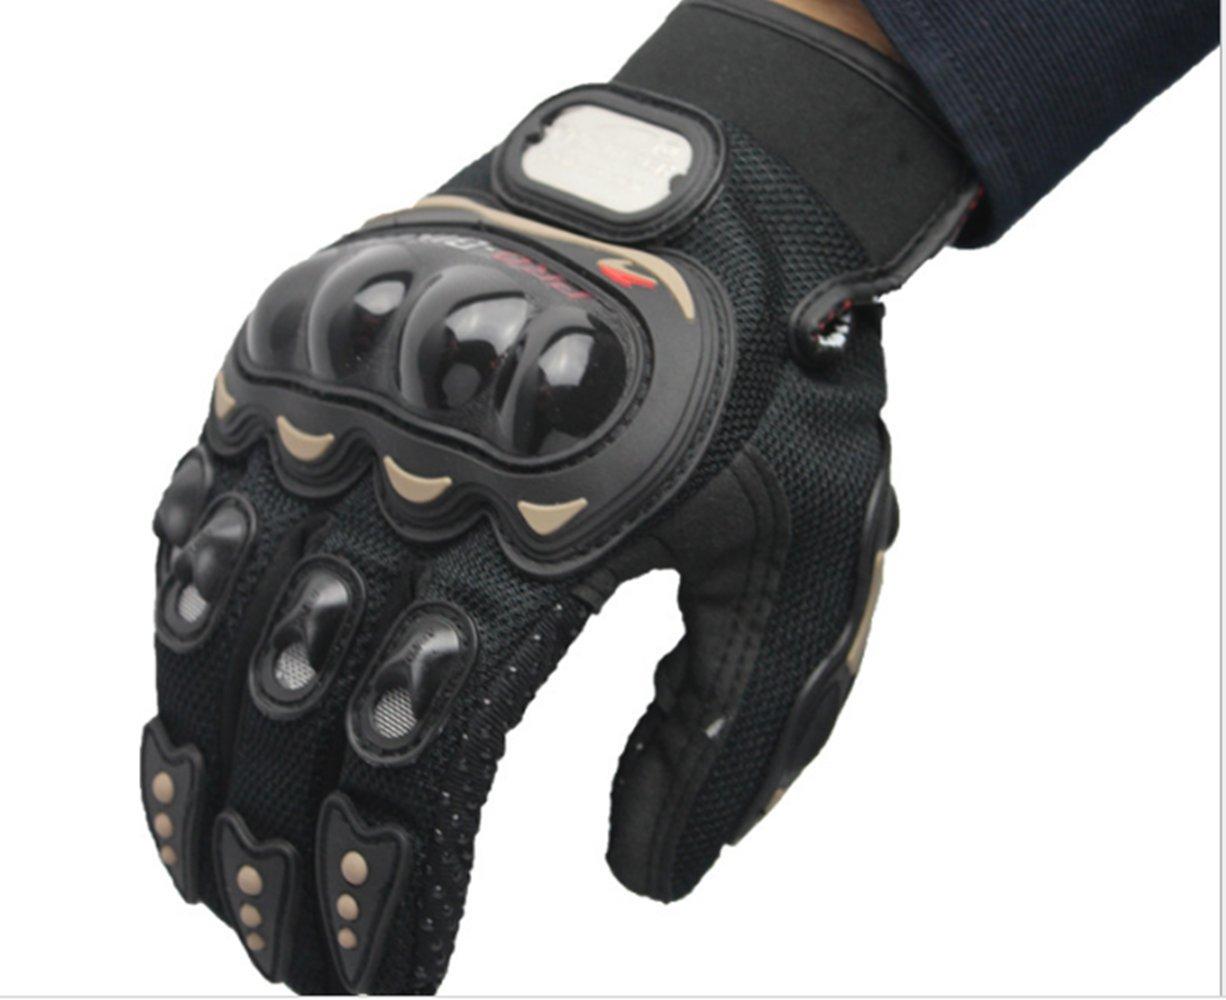 swall owuk Outdoor Sport Moto V/élo Gants Full Finger gants de cyclisme Racing